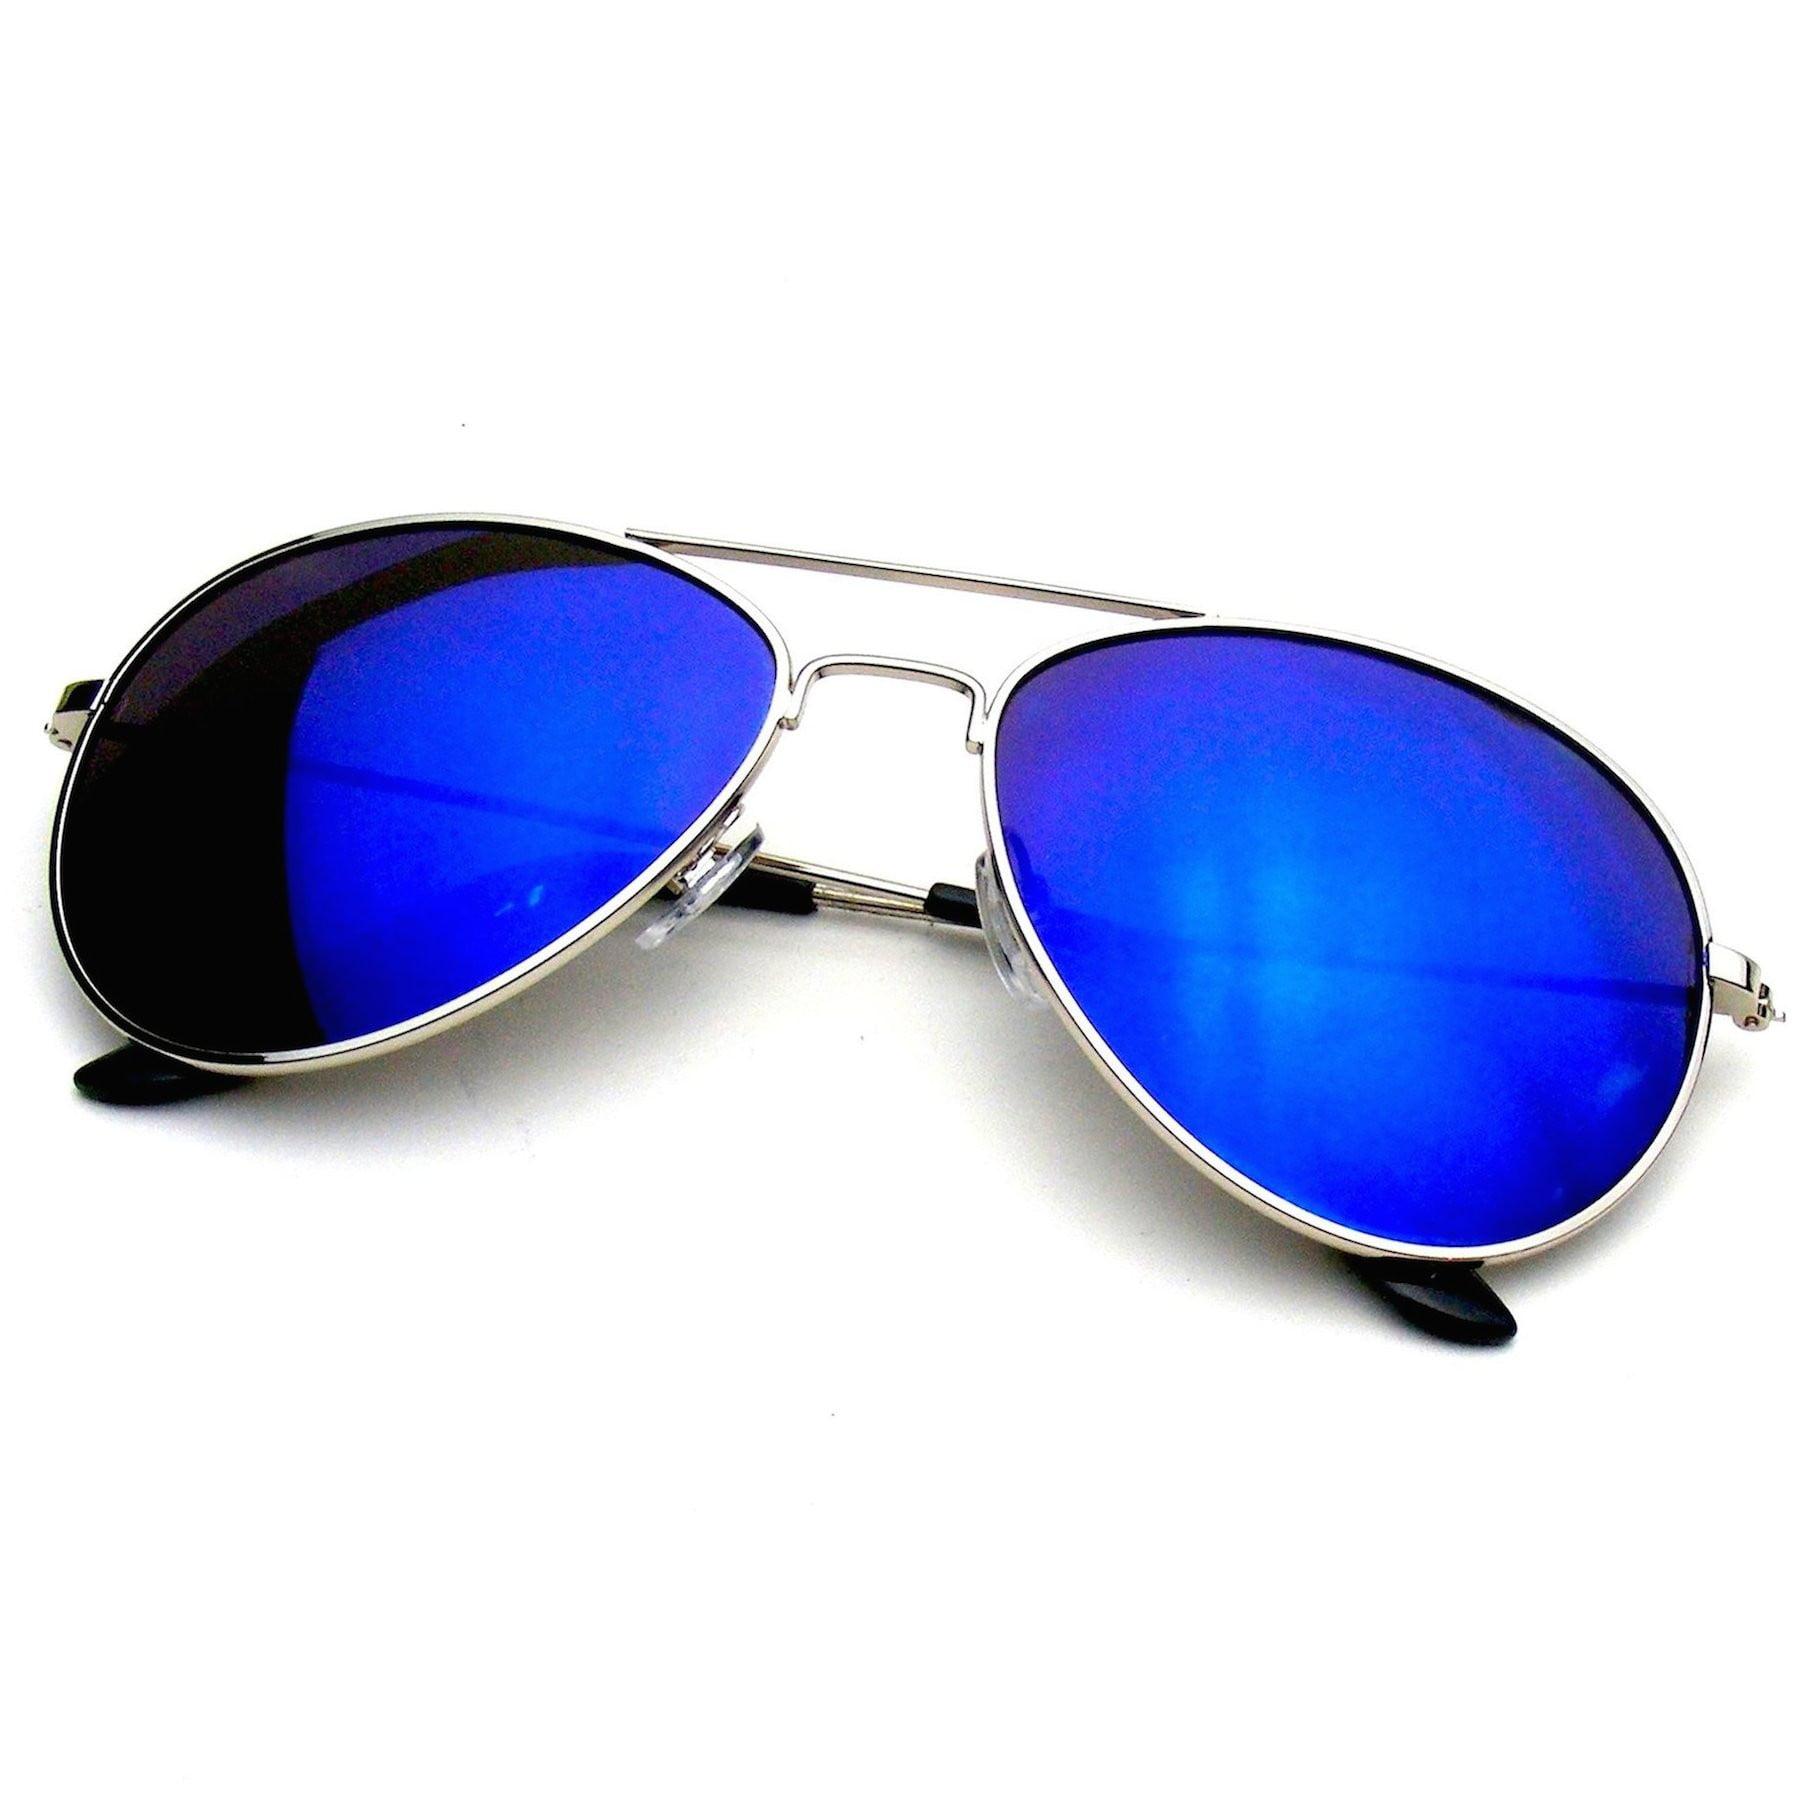 385e8cd812 Emblem Eyewear - Emblem Eyewear - Premium Classic Metal Frame Reflective  Mirror Lens Aviator Sunglasses - Walmart.com